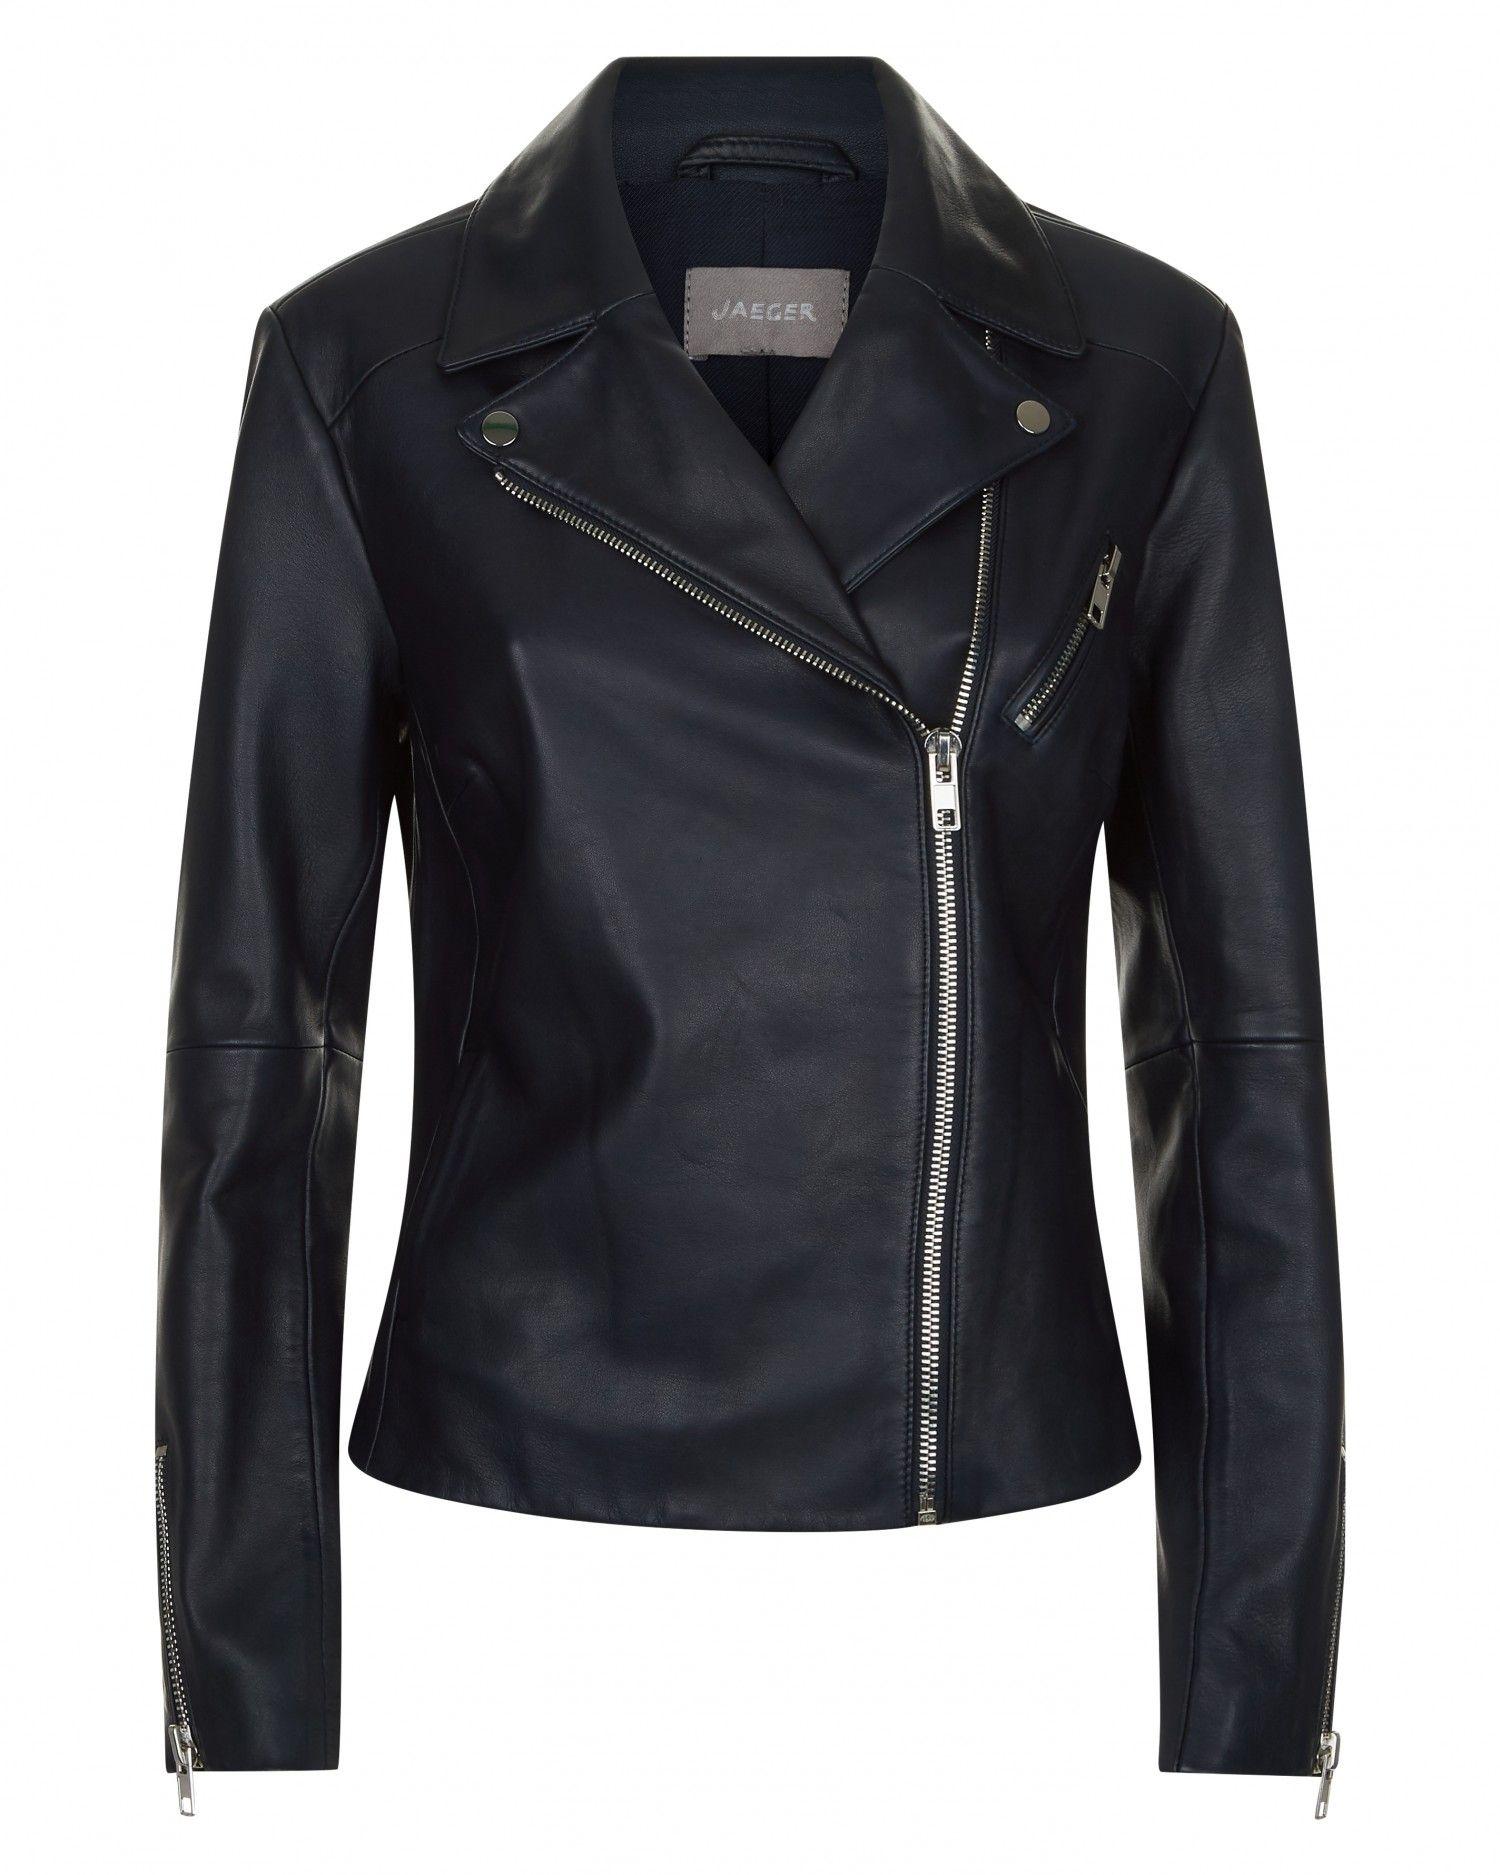 Essential Casual Biker Jacket Casual, Jackets, Fashion